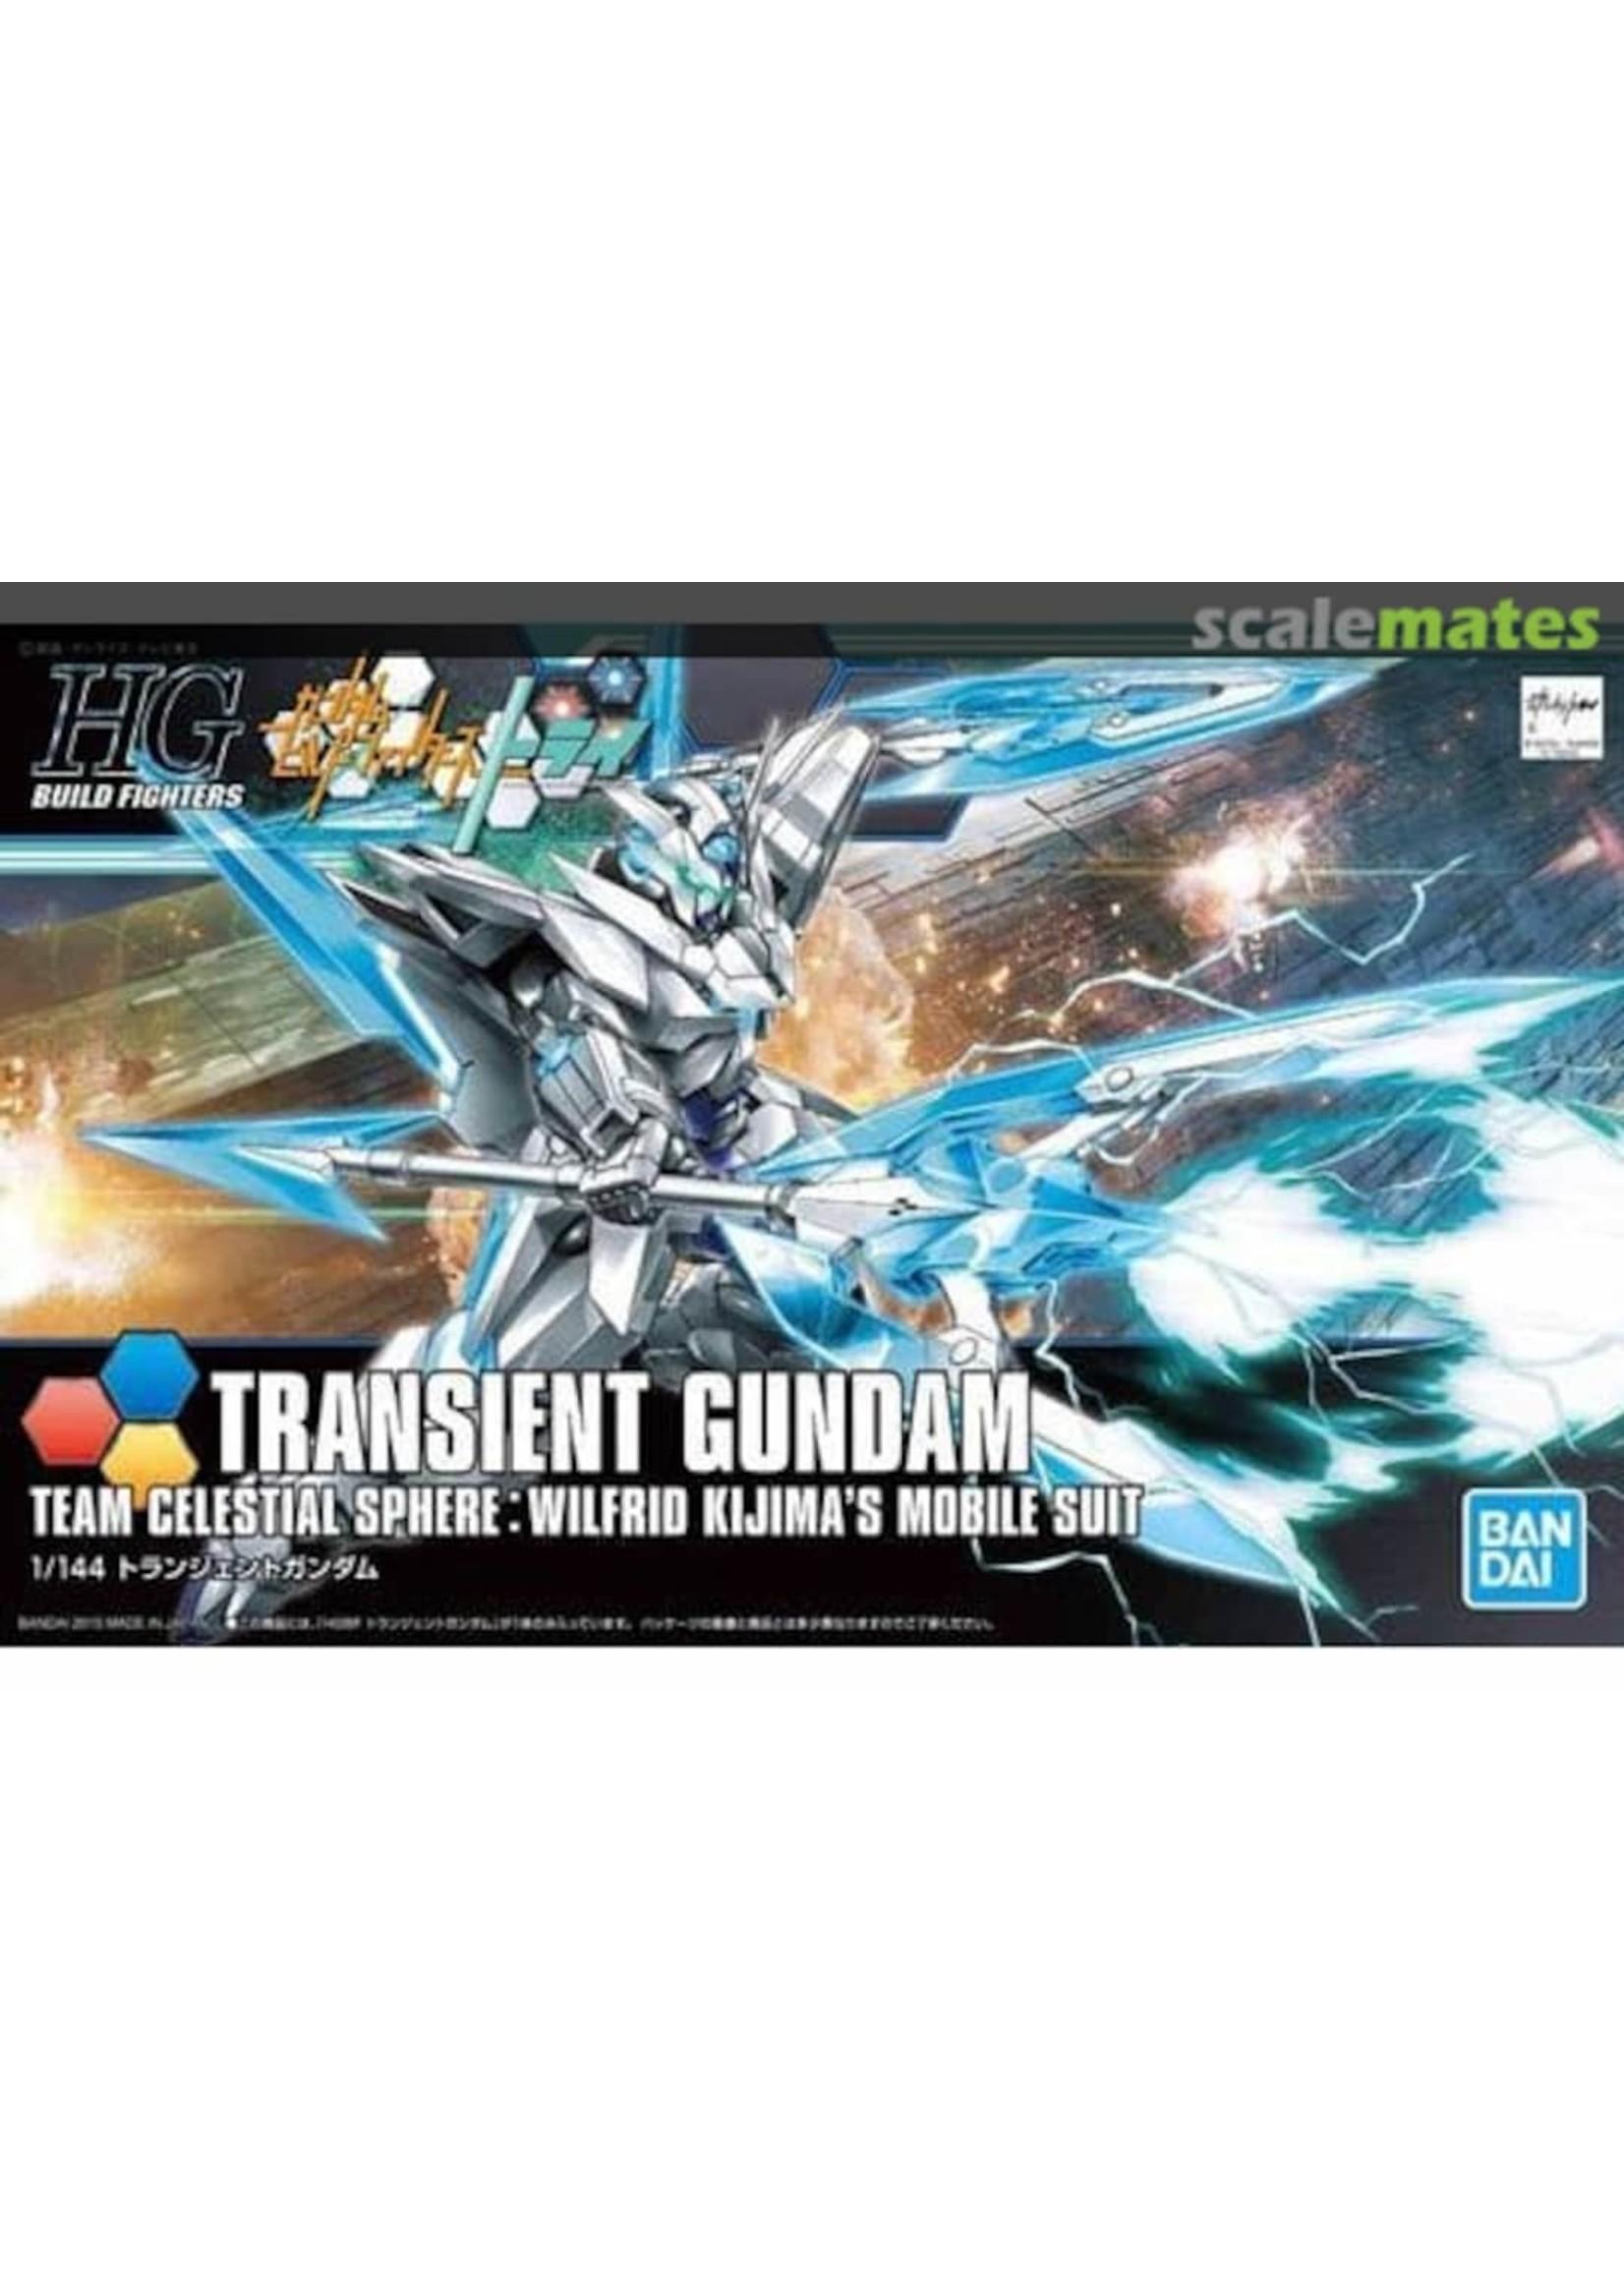 Gundam: 1/144 Transient Gundam Wilfrid Kijima's Mobile Suit